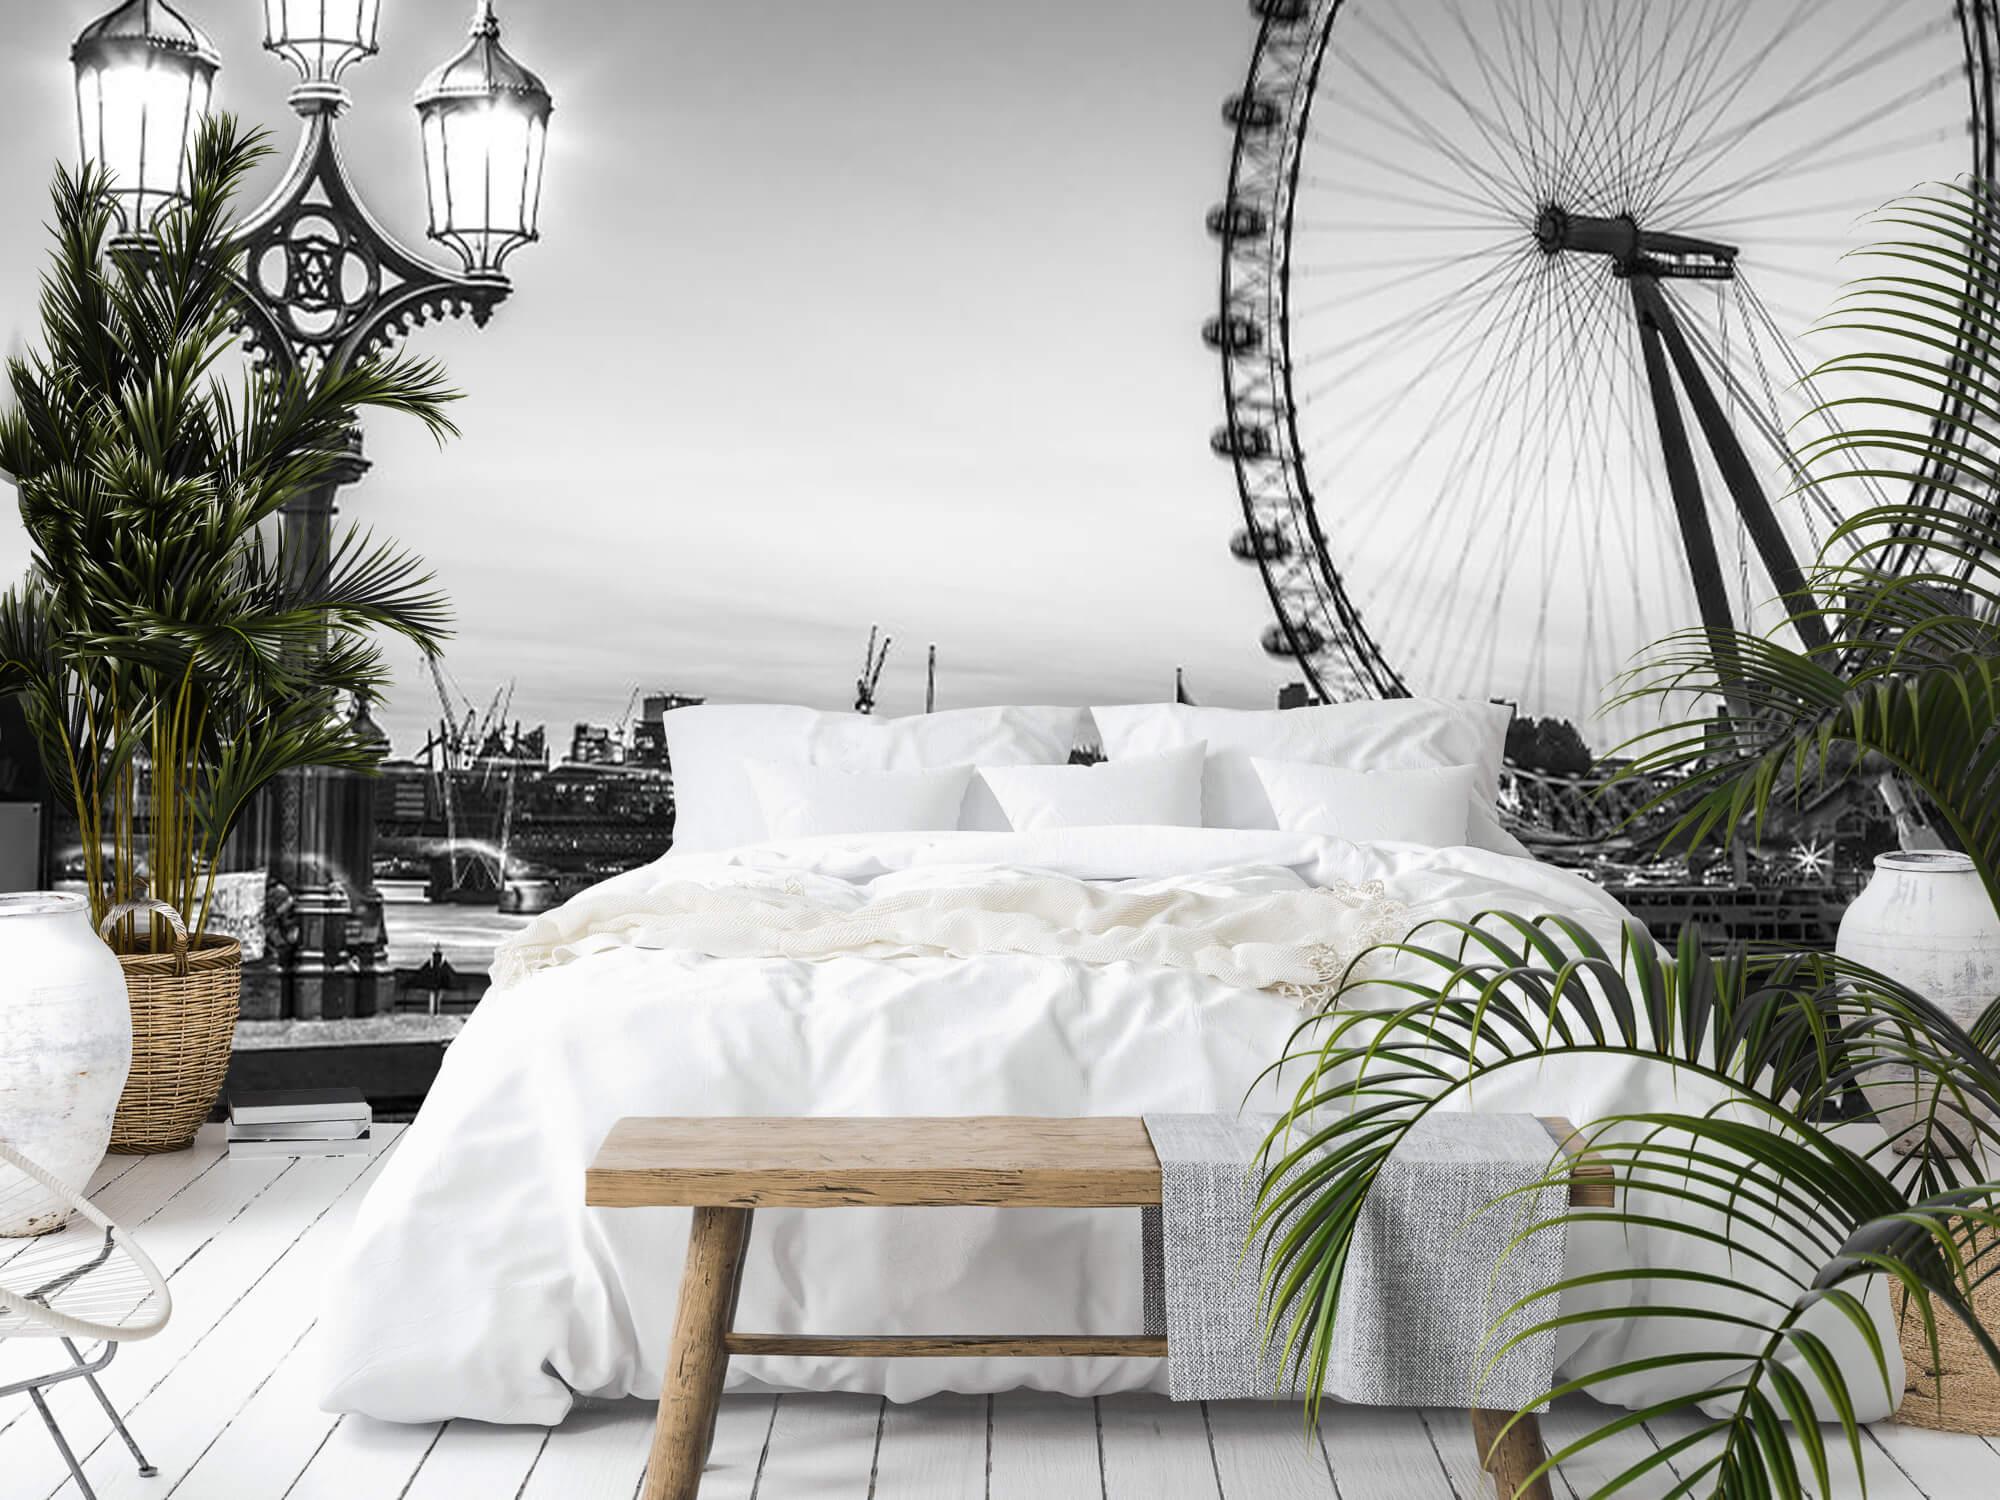 Ferris wheel black and white 3